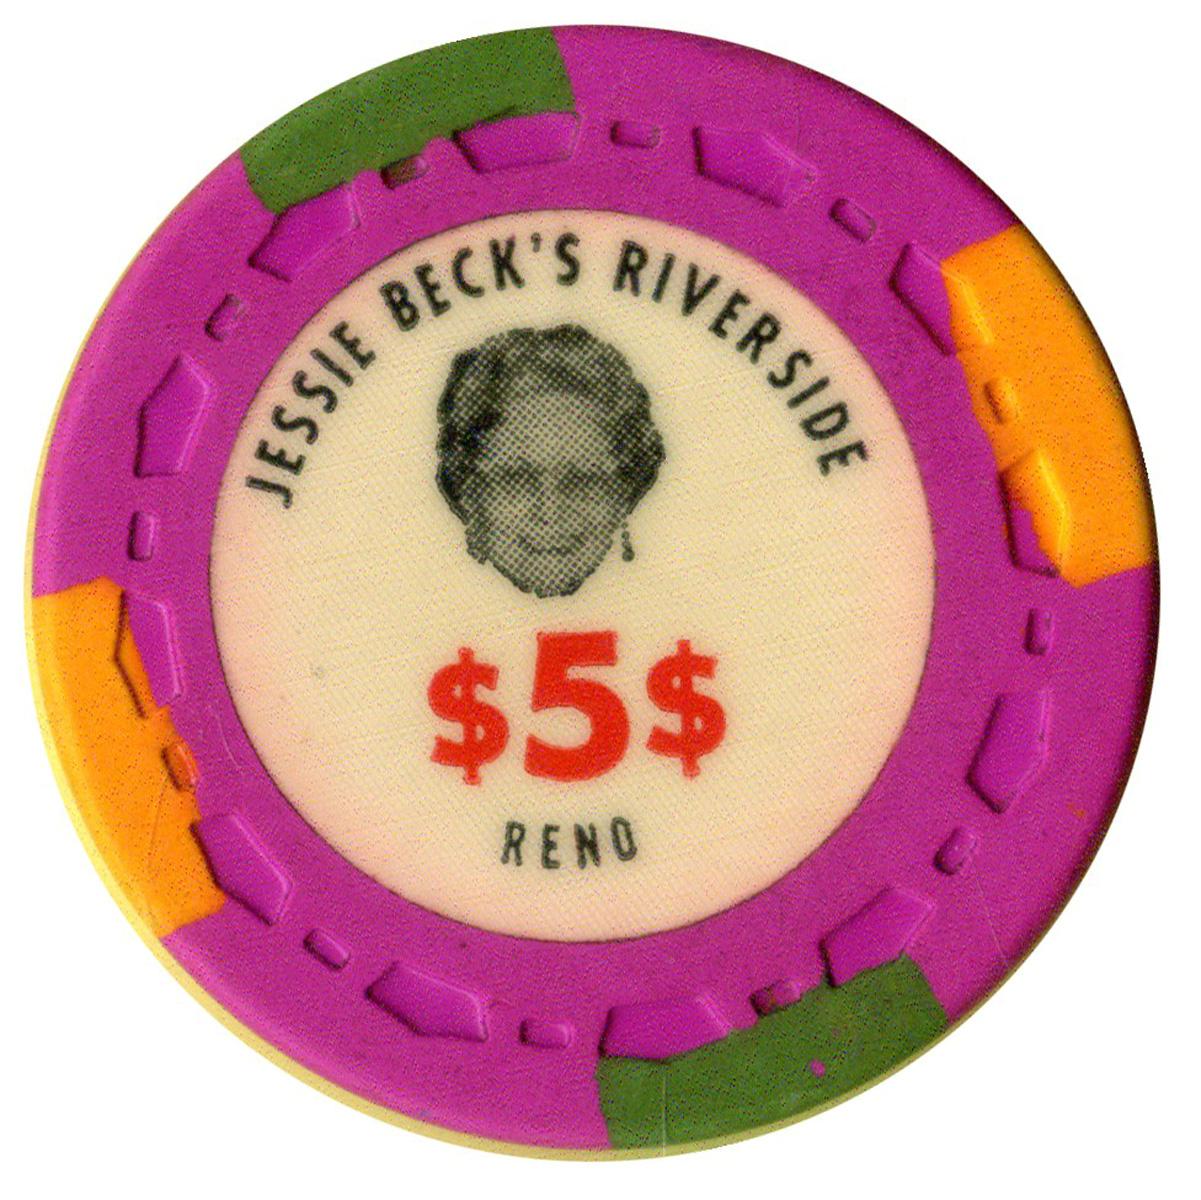 Jessie Becks Riverside Hotel/Casino Reno, NV